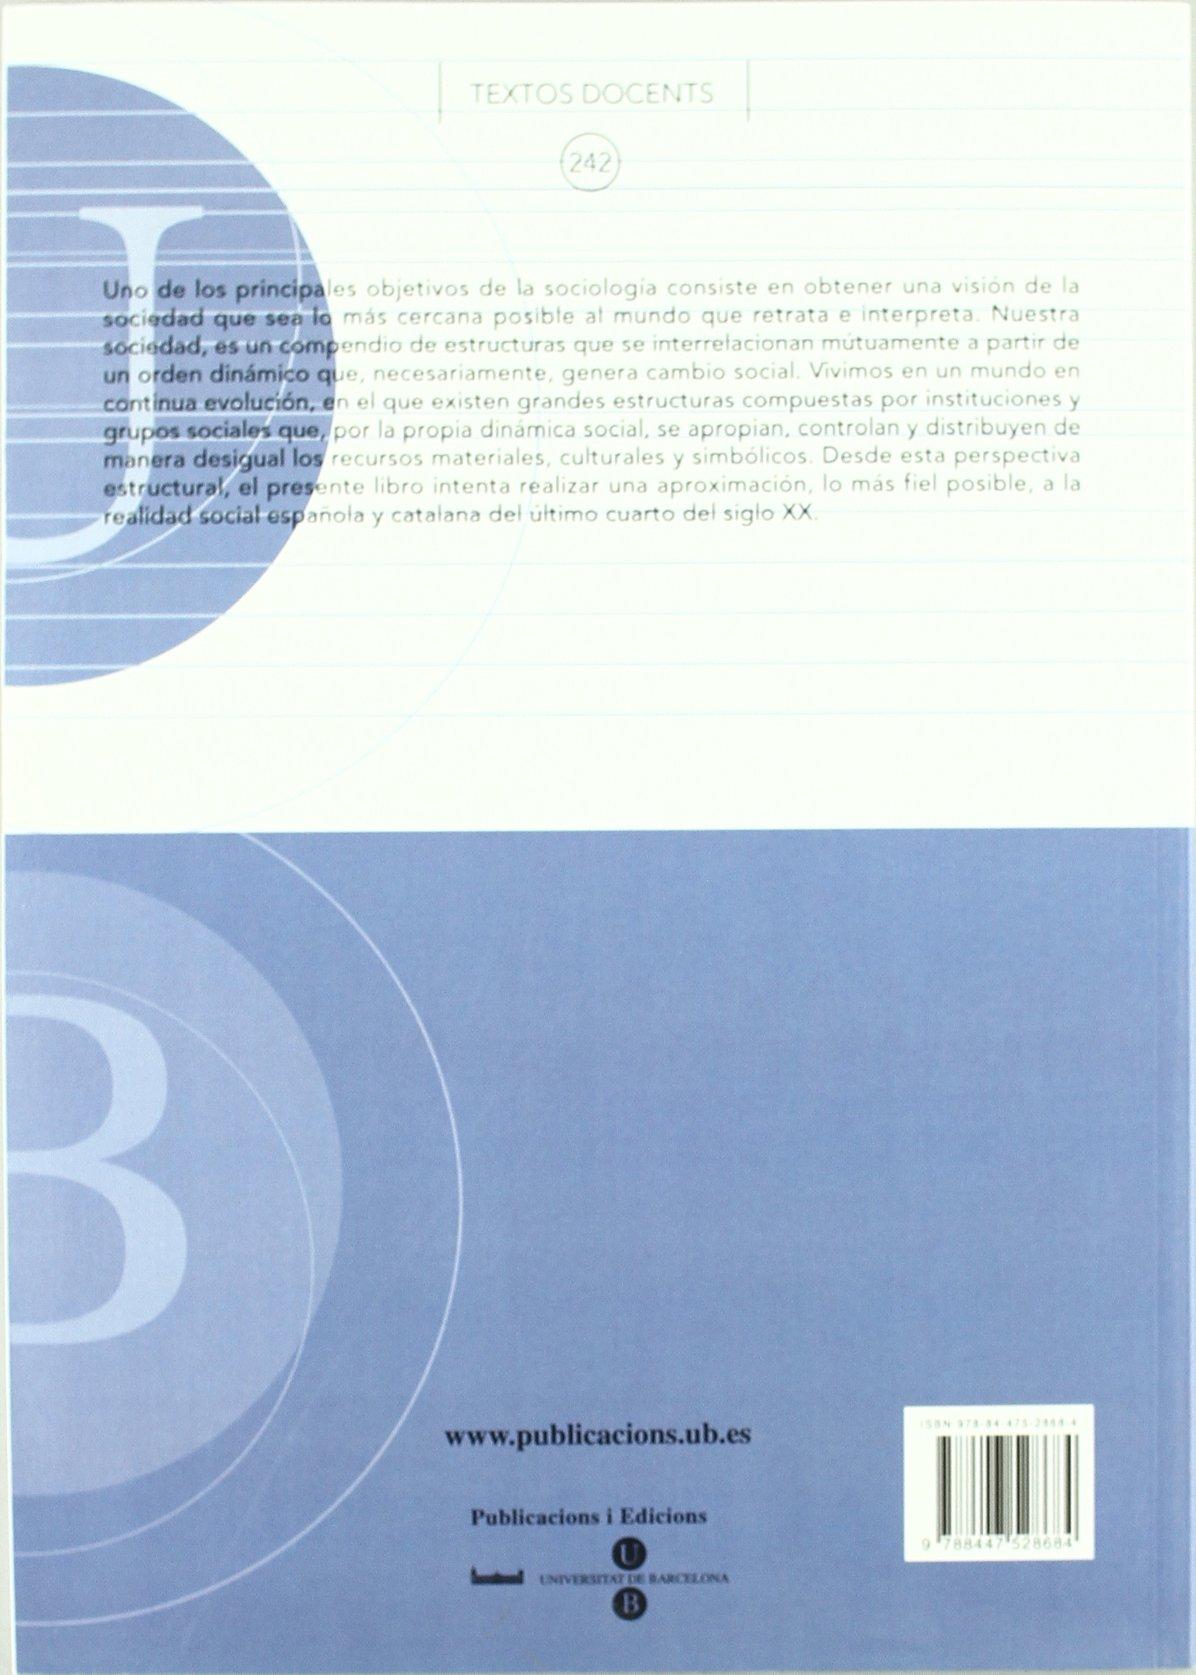 Estructura social de España y Cataluña TEXTOS DOCENTS: Amazon.es: Climent Sanjuan, Víctor: Libros